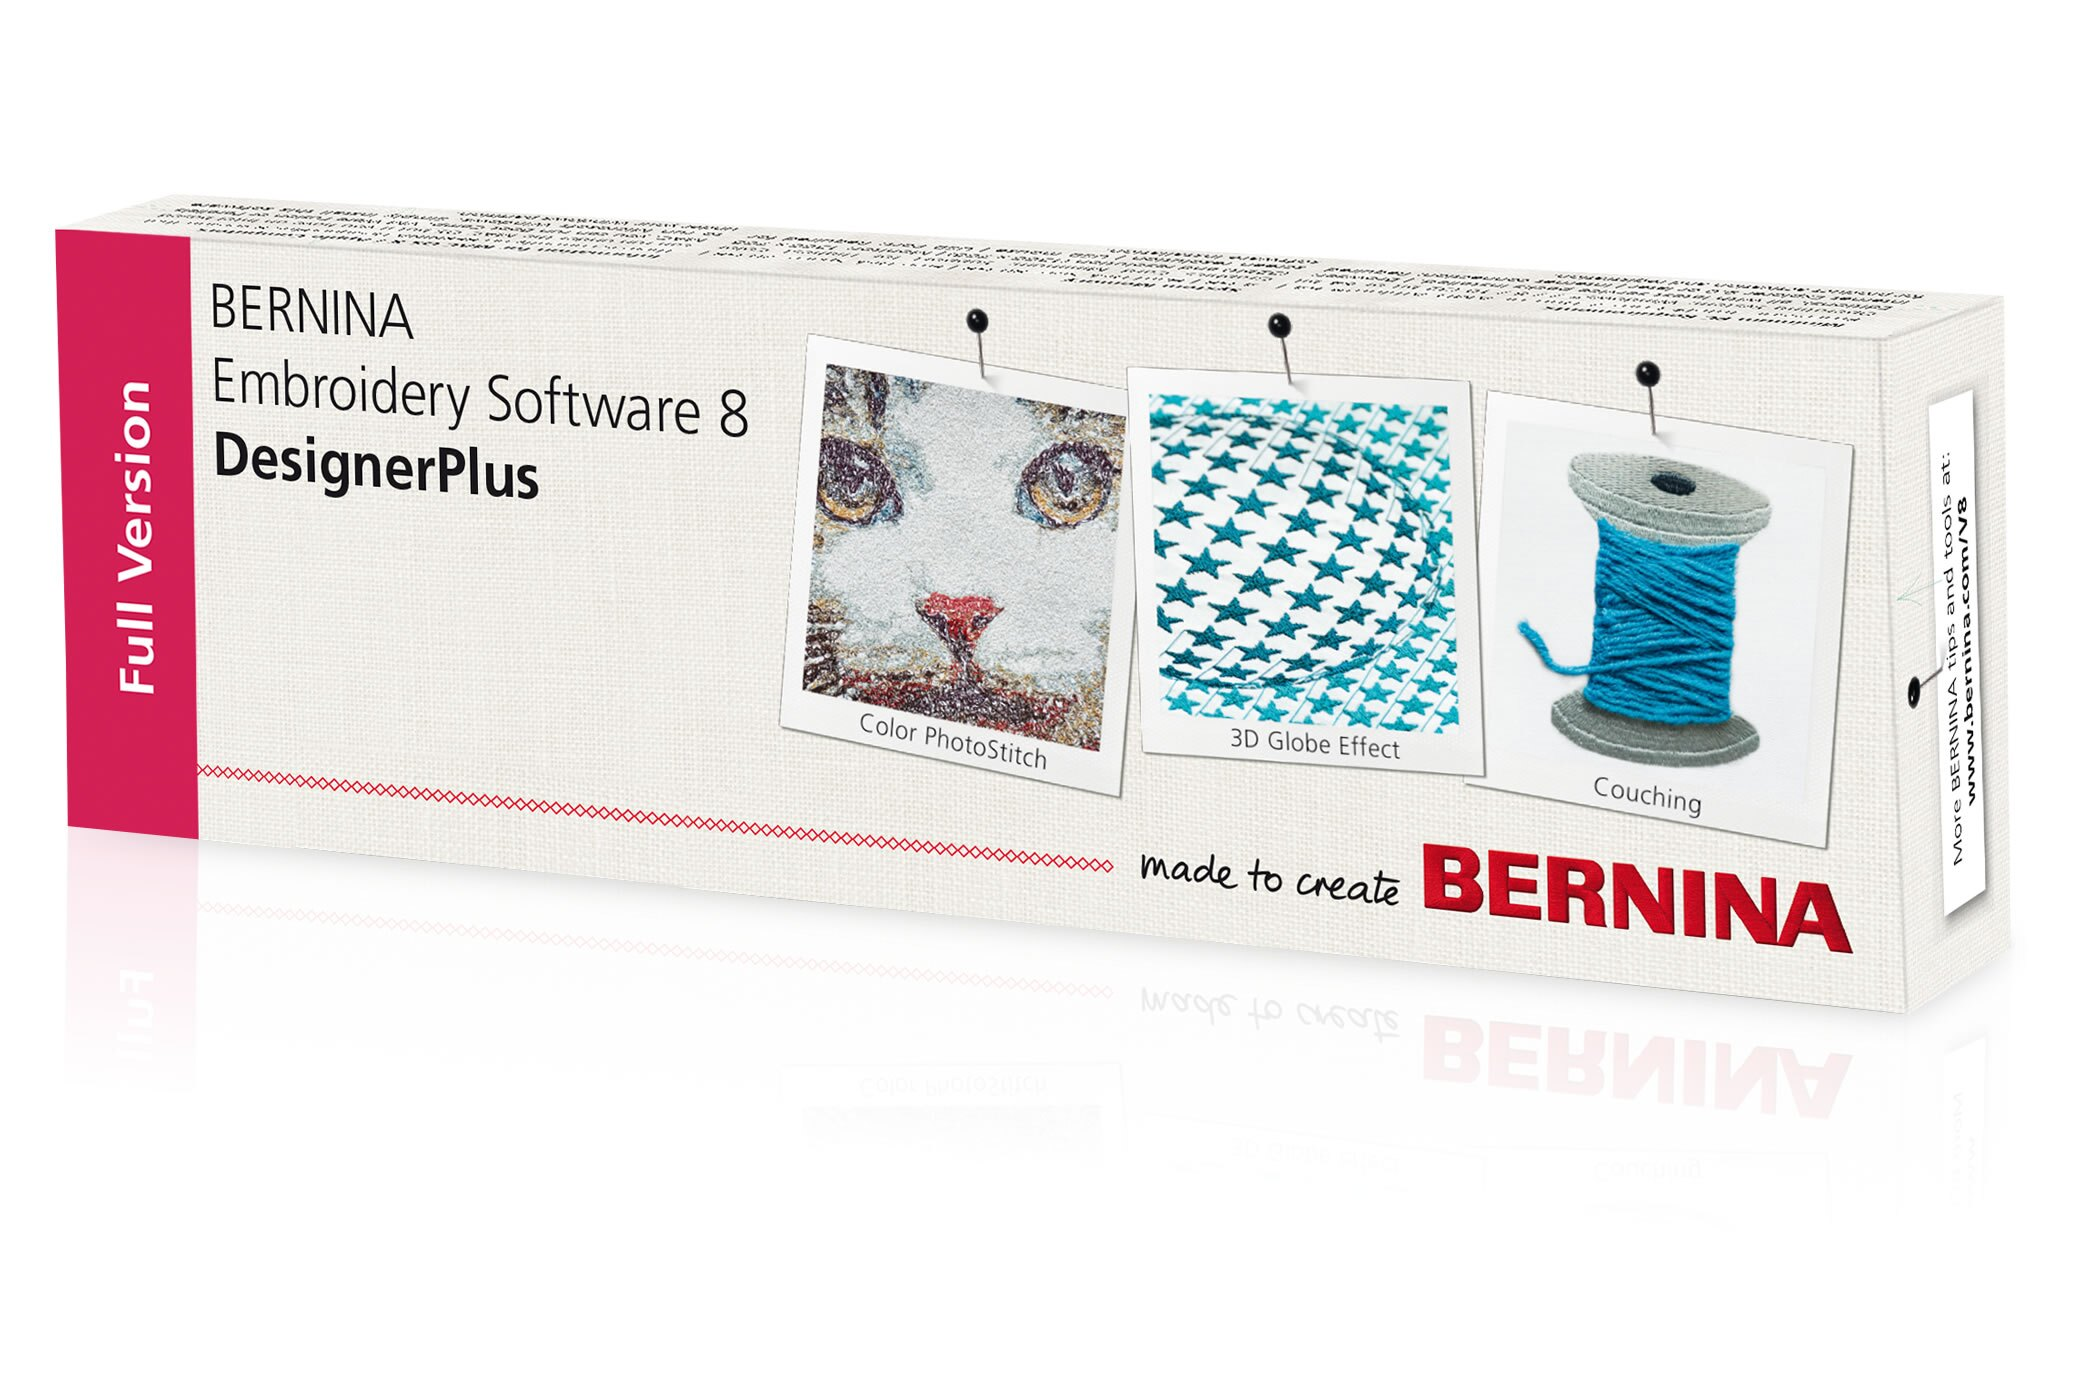 BERNINA Embroidery Software 8 刺繡軟體 (V8 刺繡軟體)